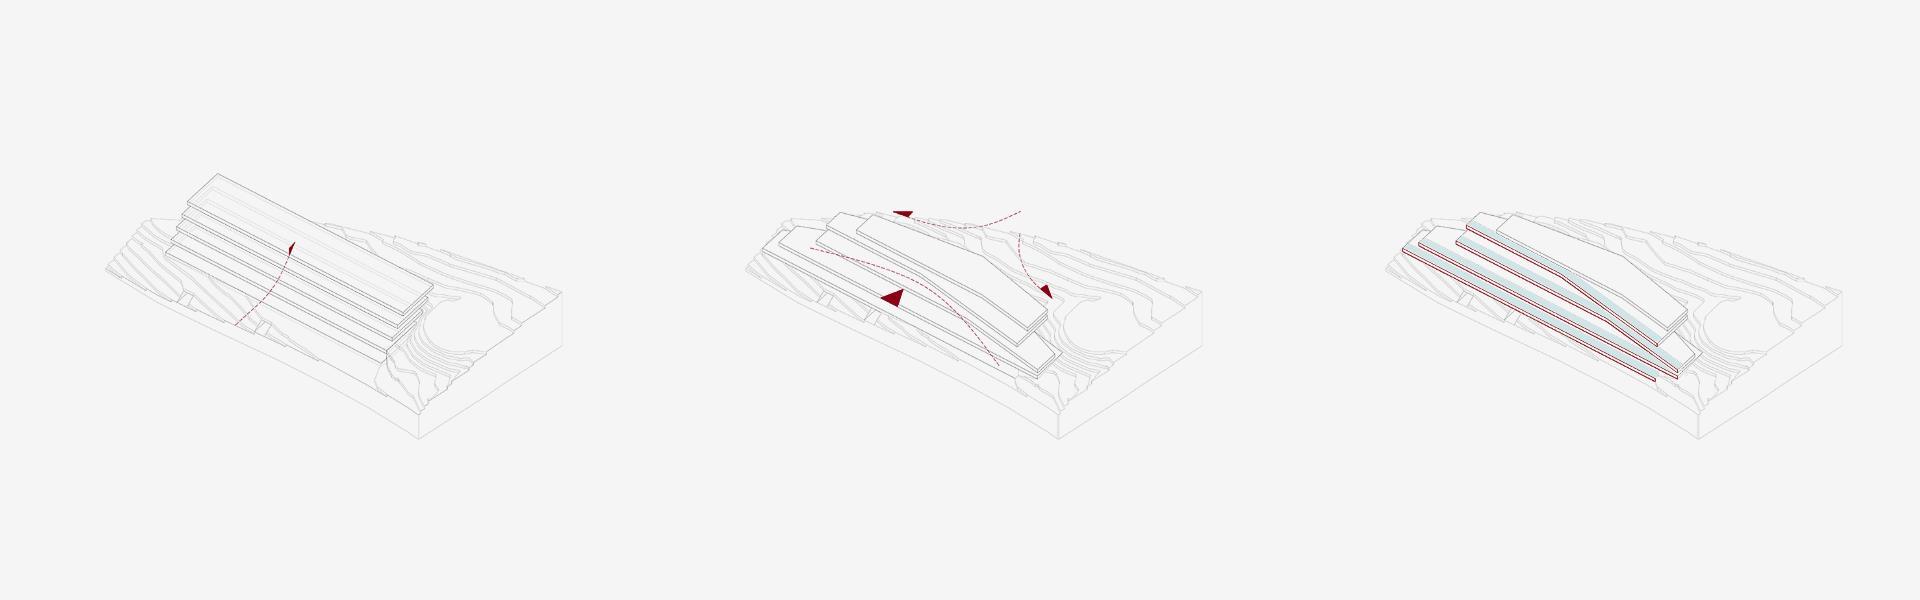 Project - Gallardo Llopis Architect